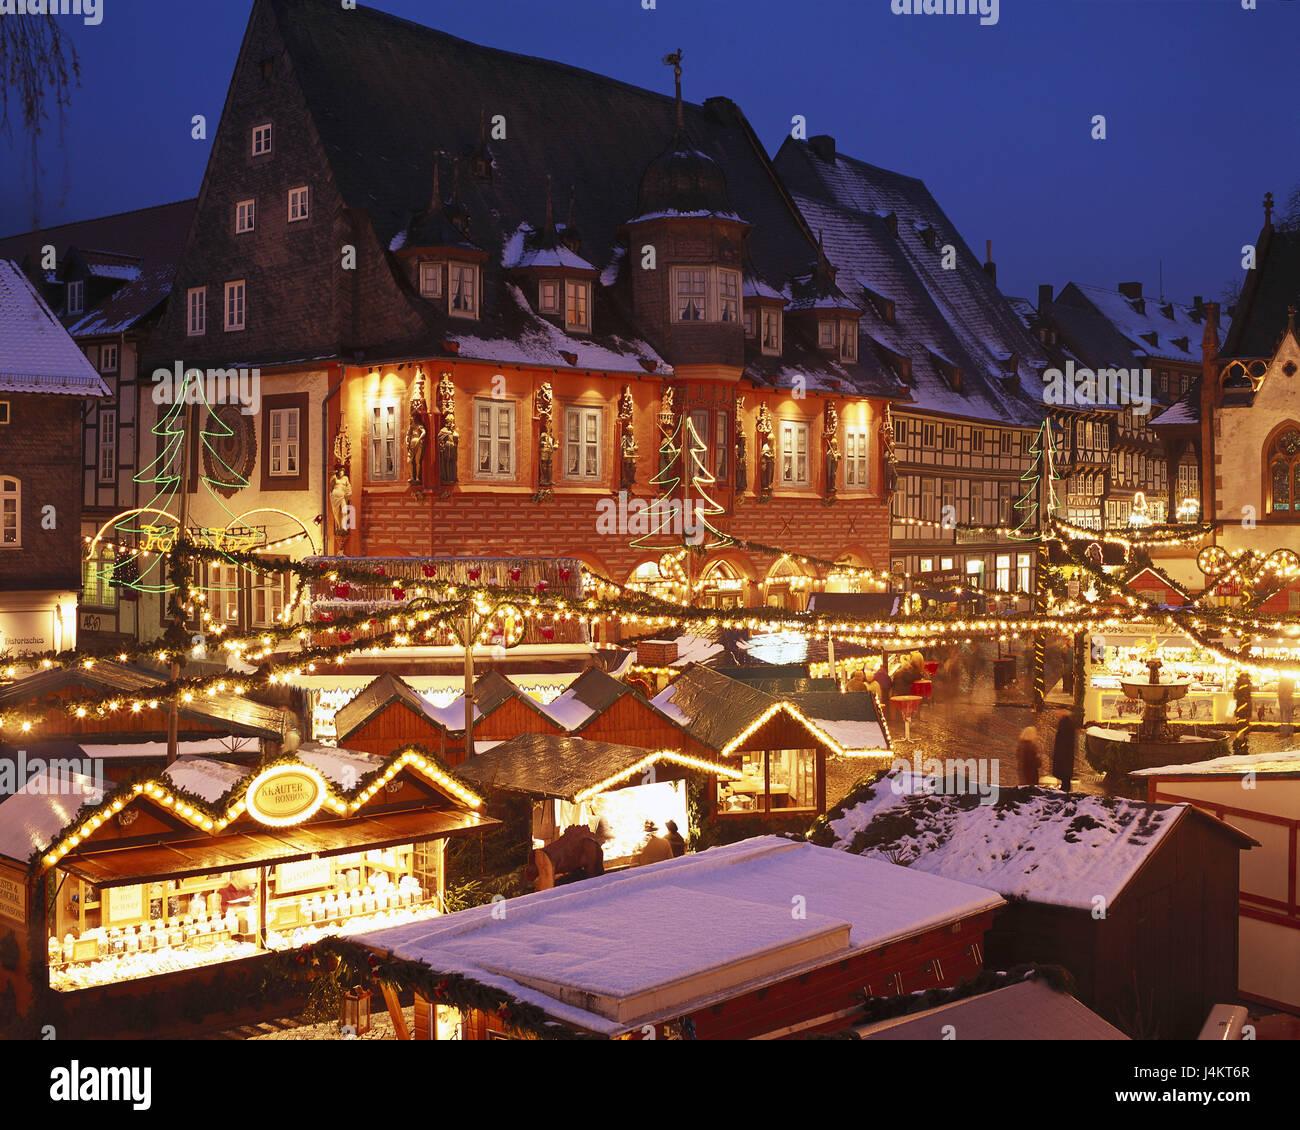 christmas market goslar germany stockfotos christmas market goslar germany bilder alamy. Black Bedroom Furniture Sets. Home Design Ideas